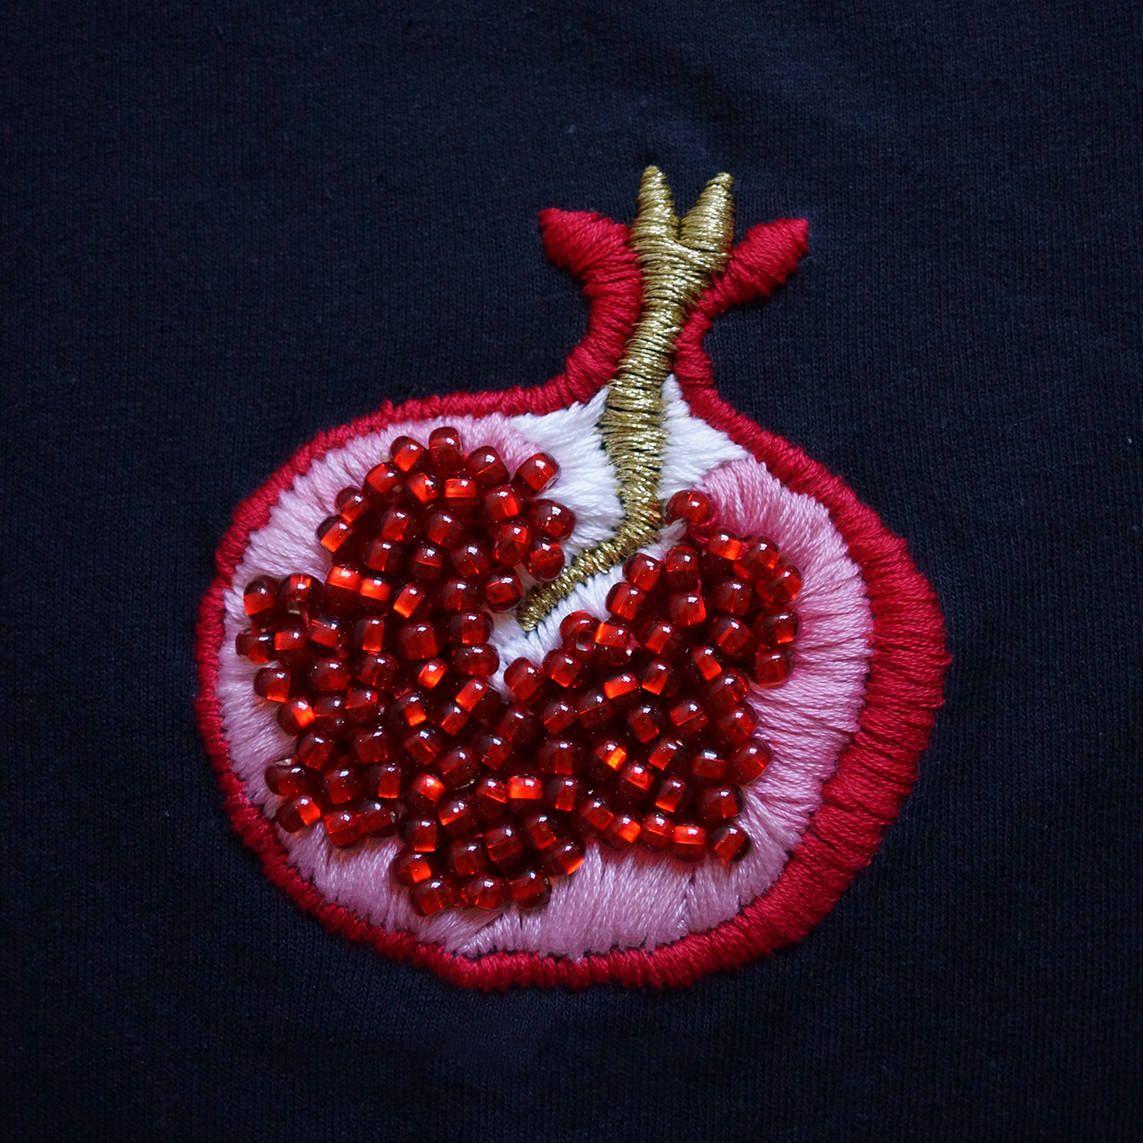 Pomegranate tshirt handbeadedembroidered patterns for